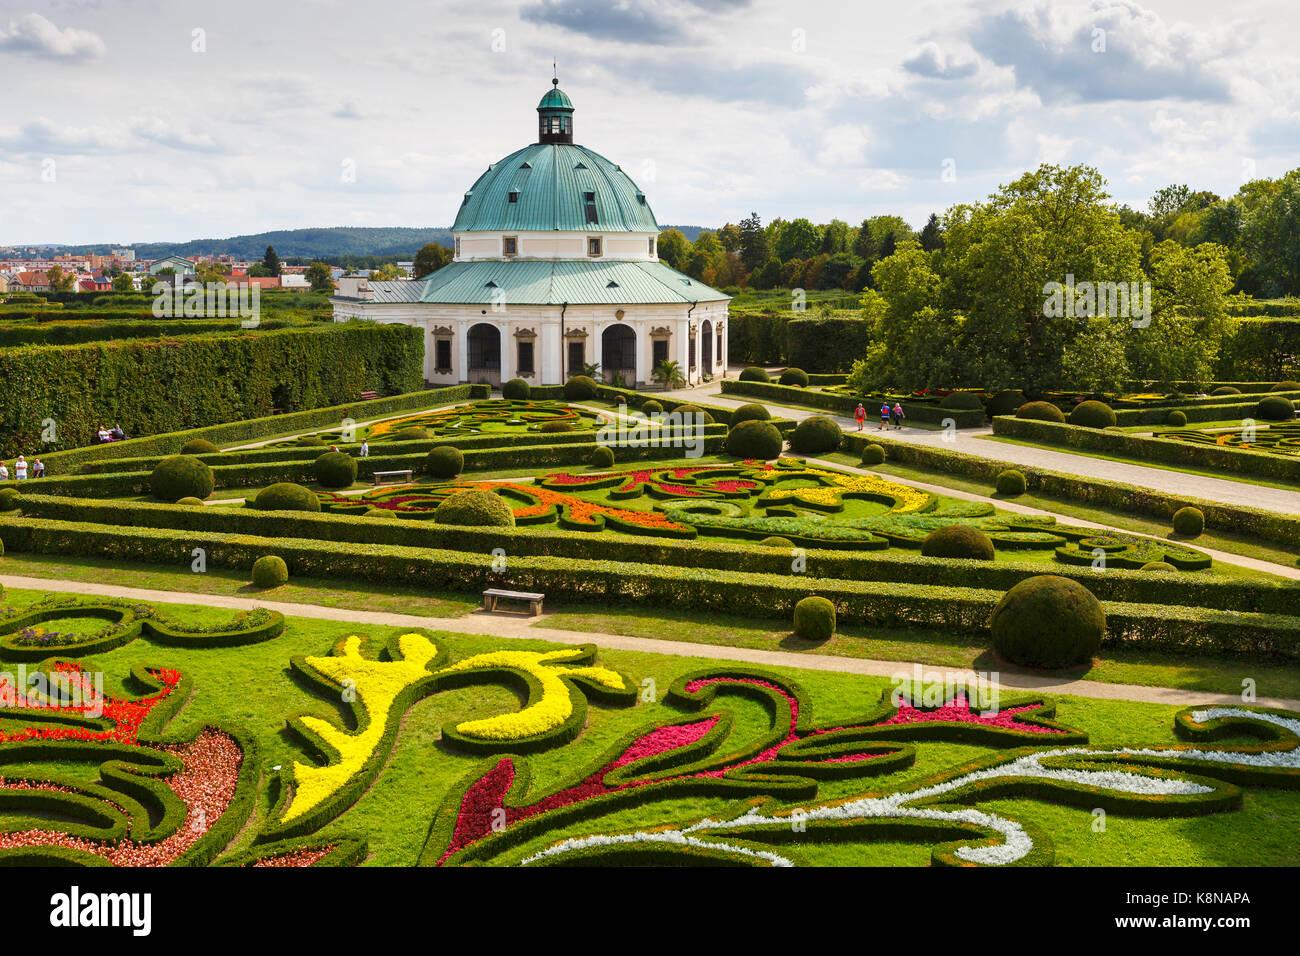 Rotunda in the centre of Baroque garden of Kromeriz, Czech Republic. - Stock Image